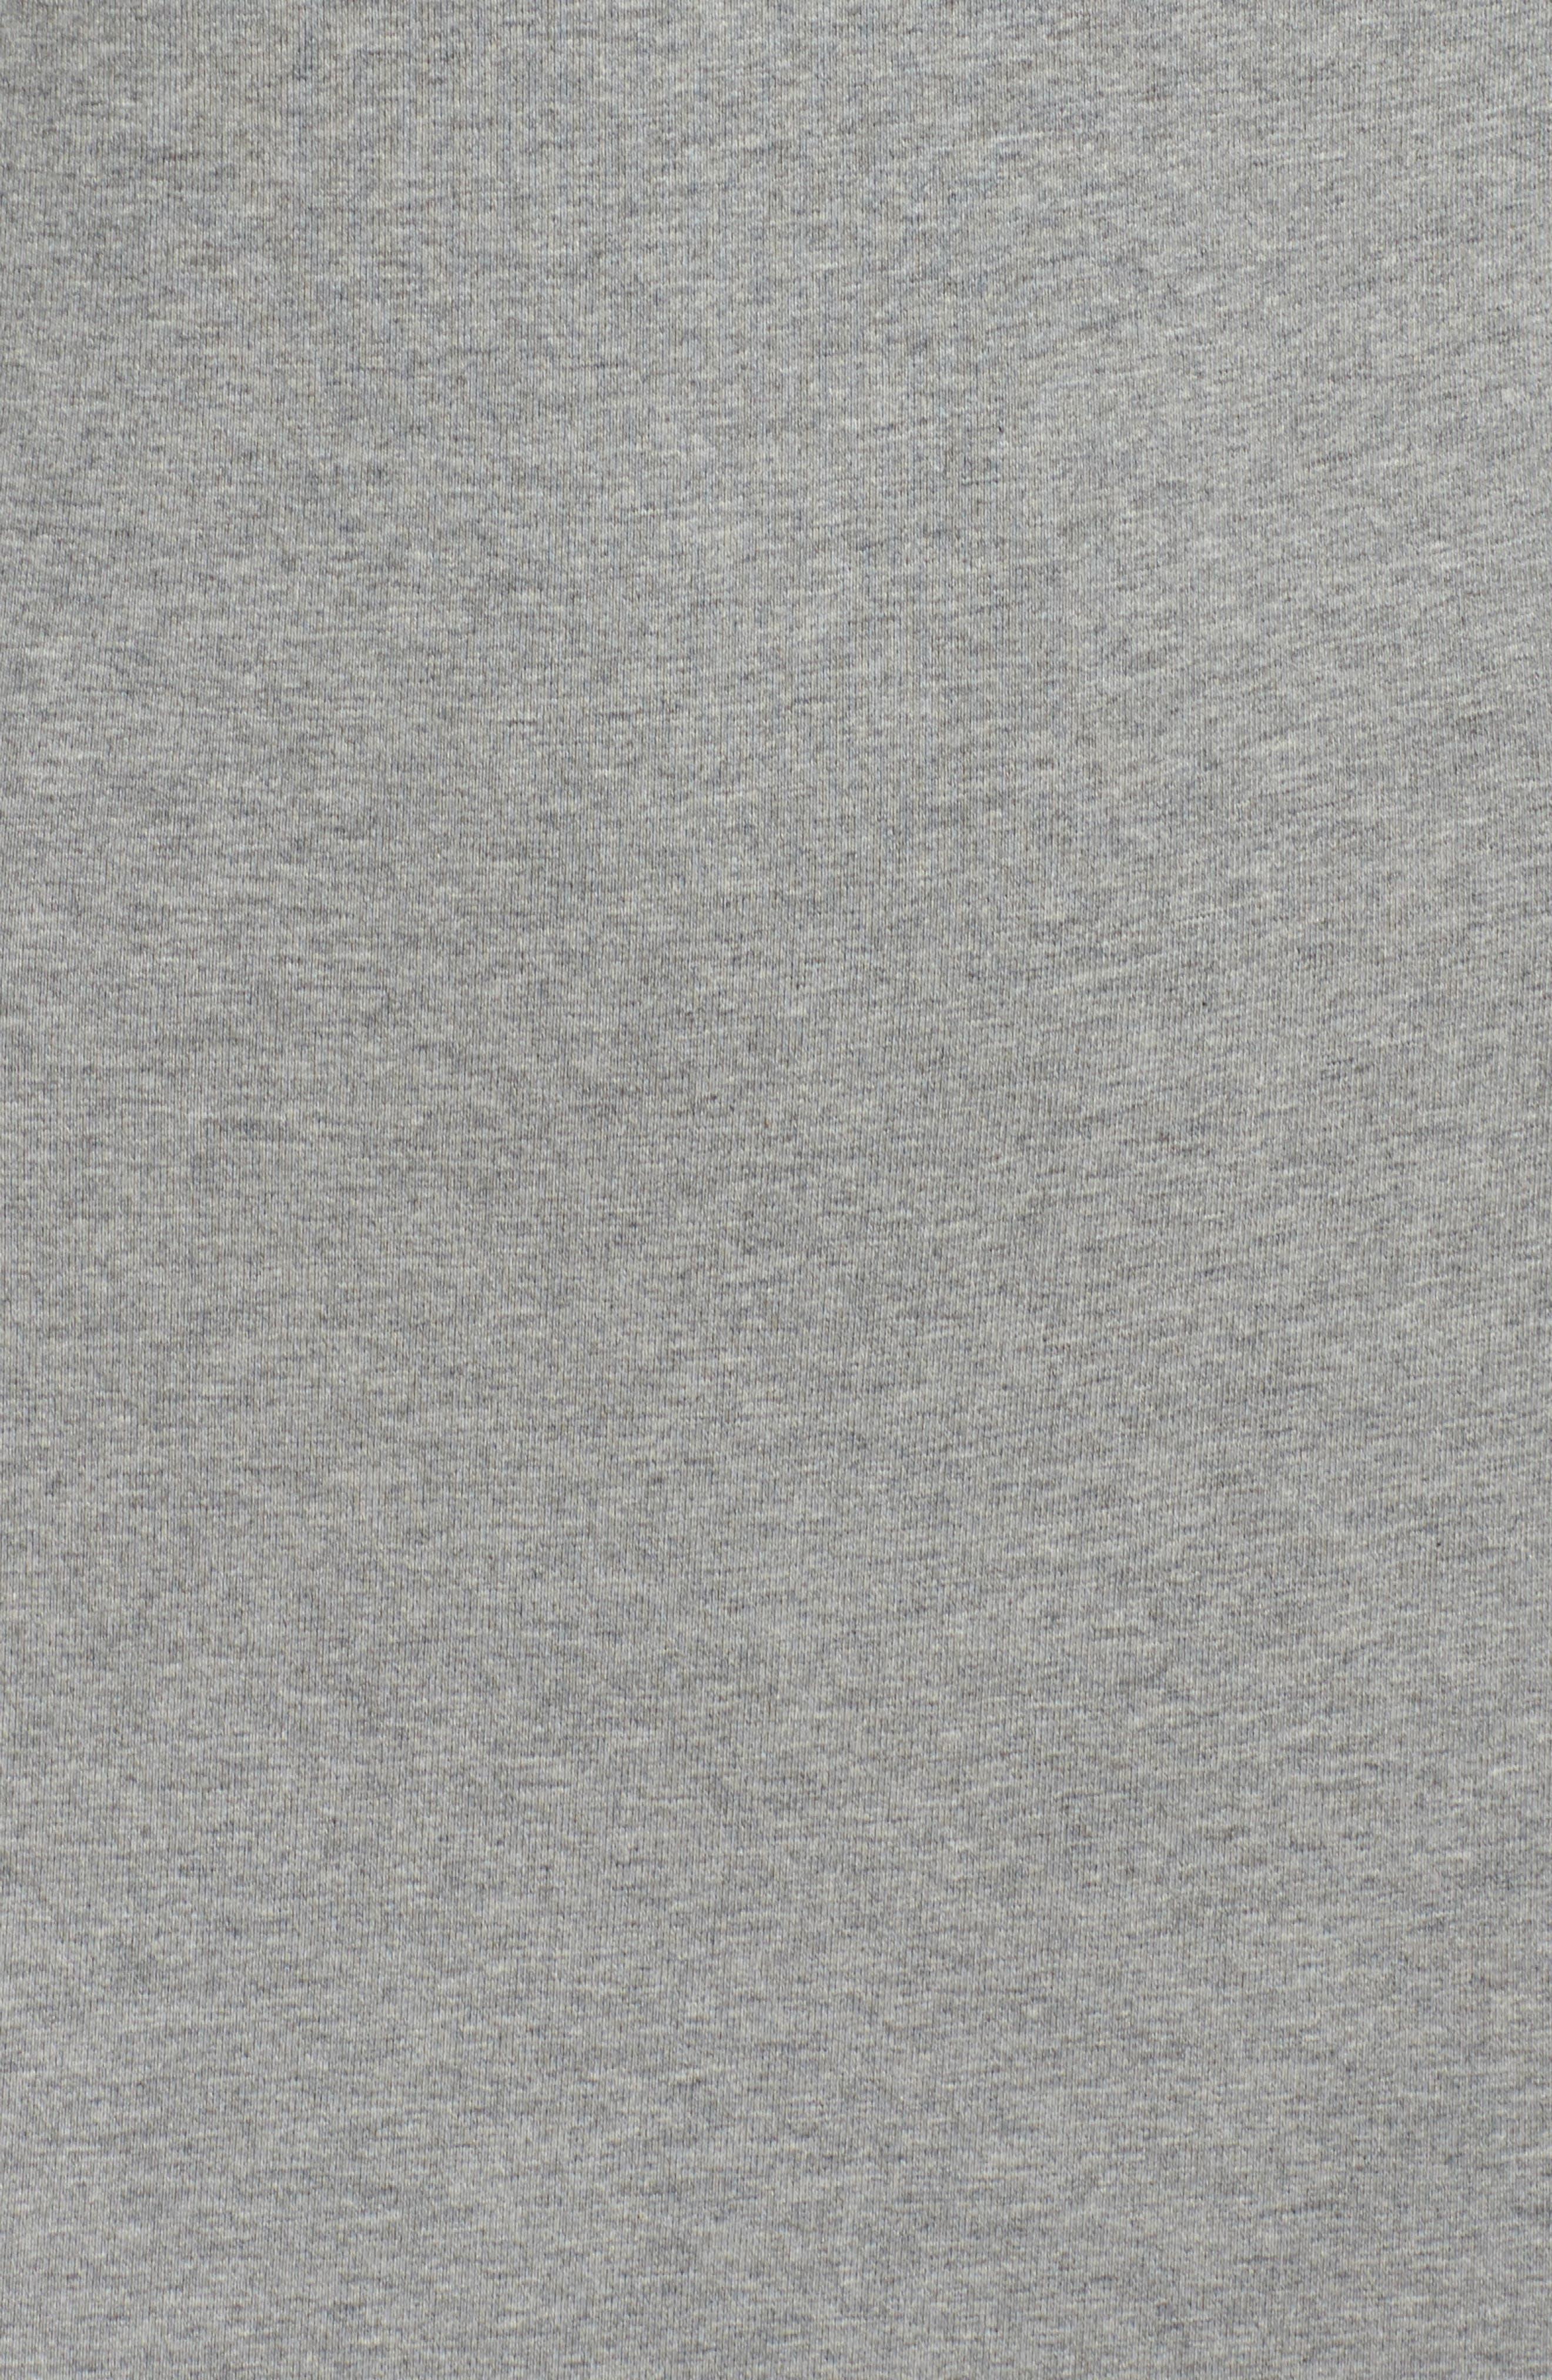 T7 Sweatshirt Dress,                             Alternate thumbnail 20, color,